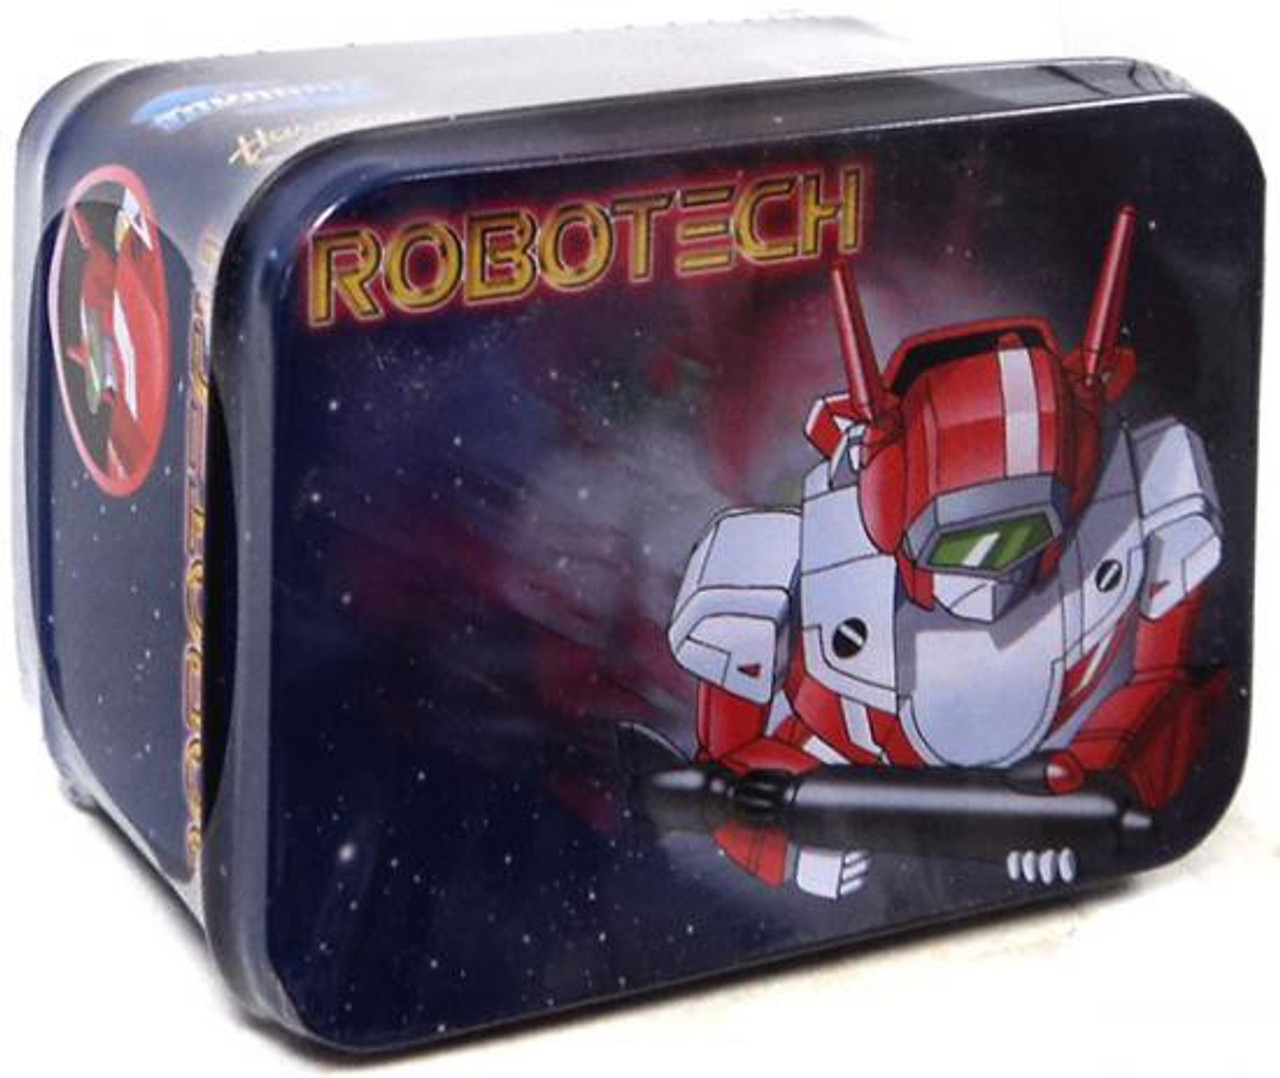 Robotech Macross Super Deformed Veritech Chromed VF-1J Action Figure [Milia]